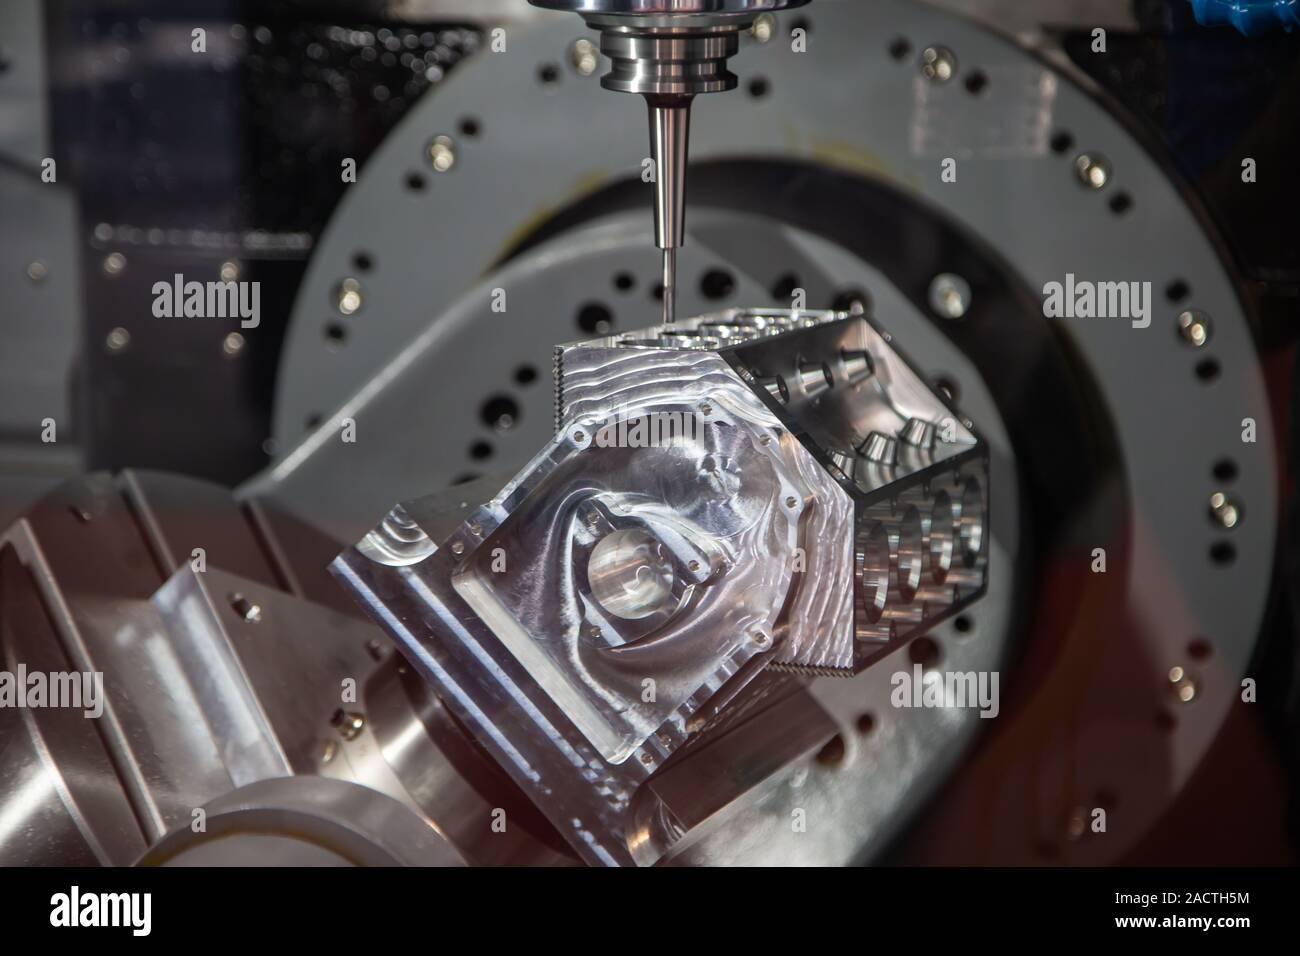 Modern industry CNC milling machine cutting sample workpiece Stock Photo